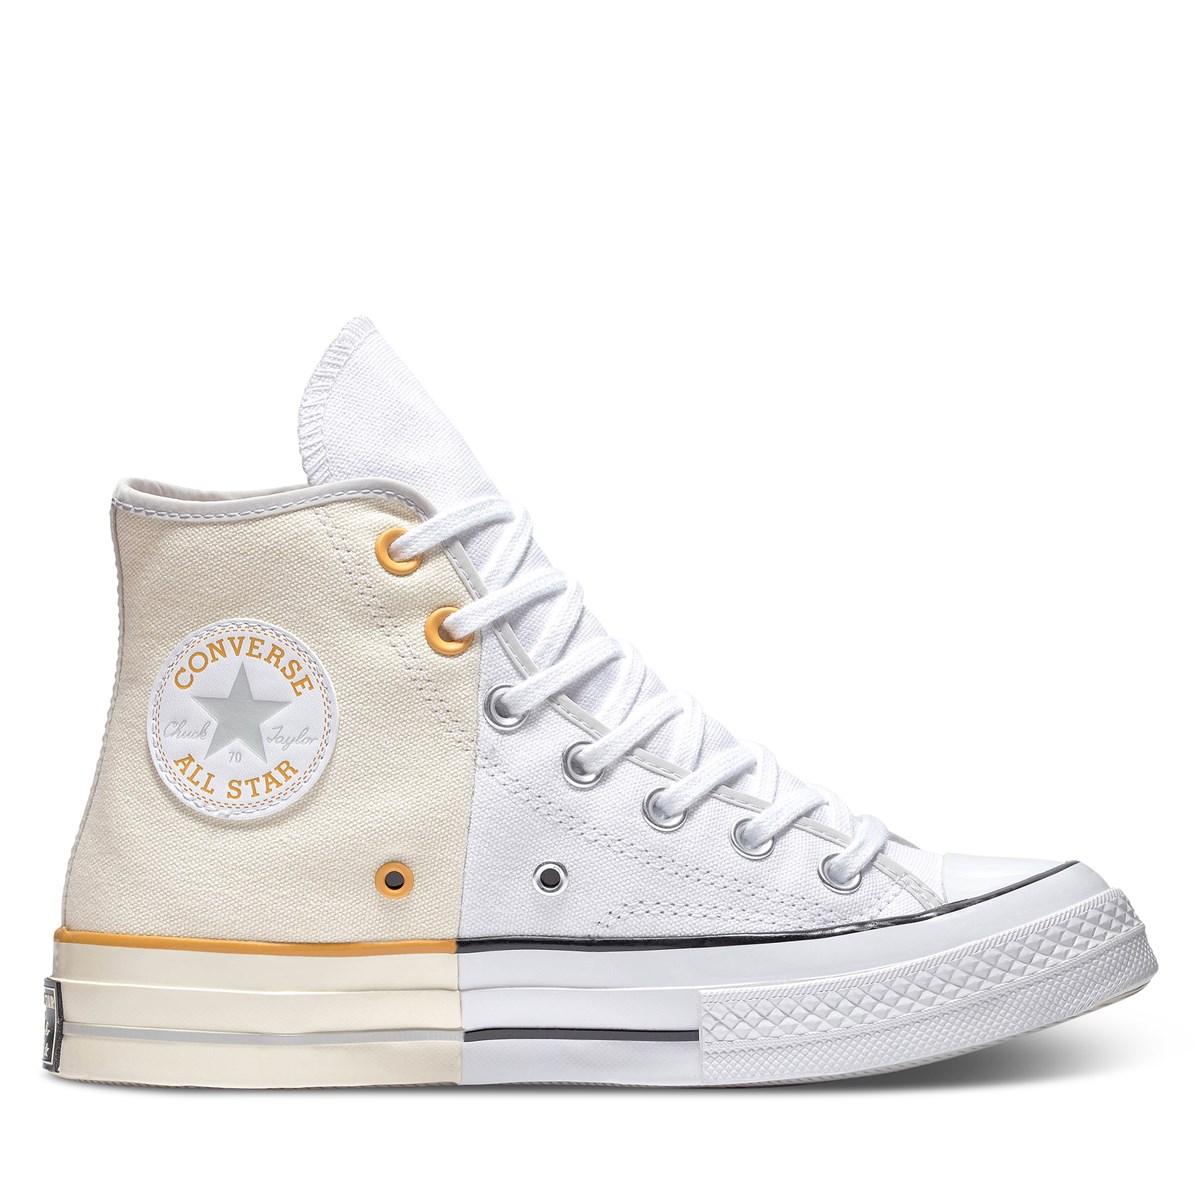 Women's Chuck 70 Hi Sneakers in White